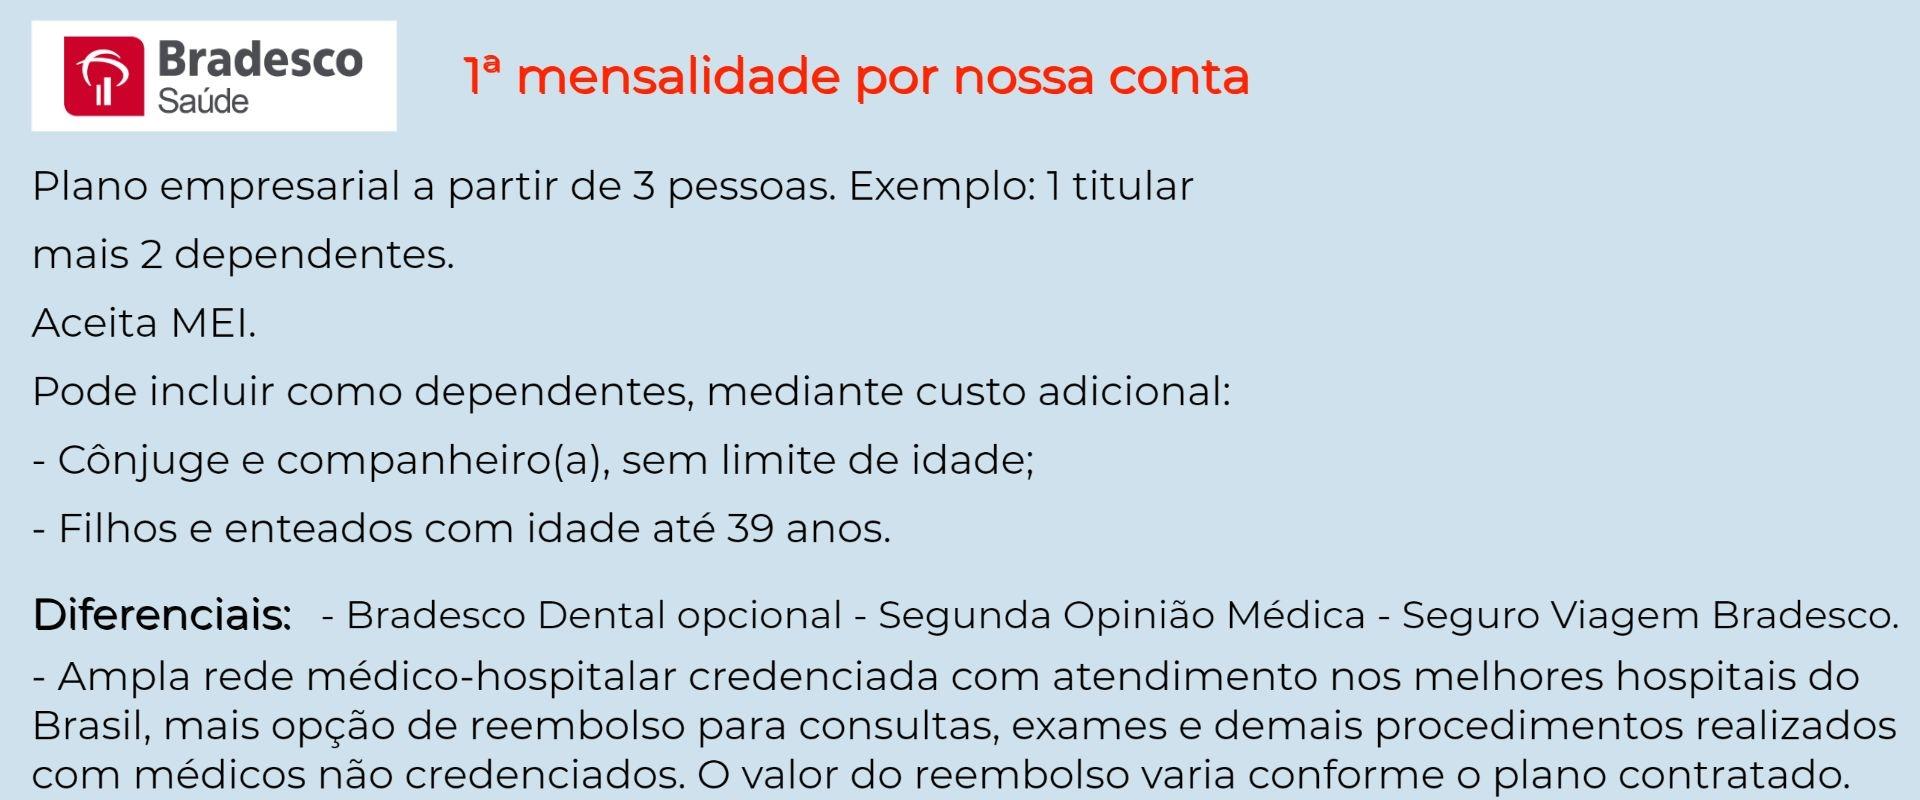 Bradesco Saúde Empresarial - Ceilândia